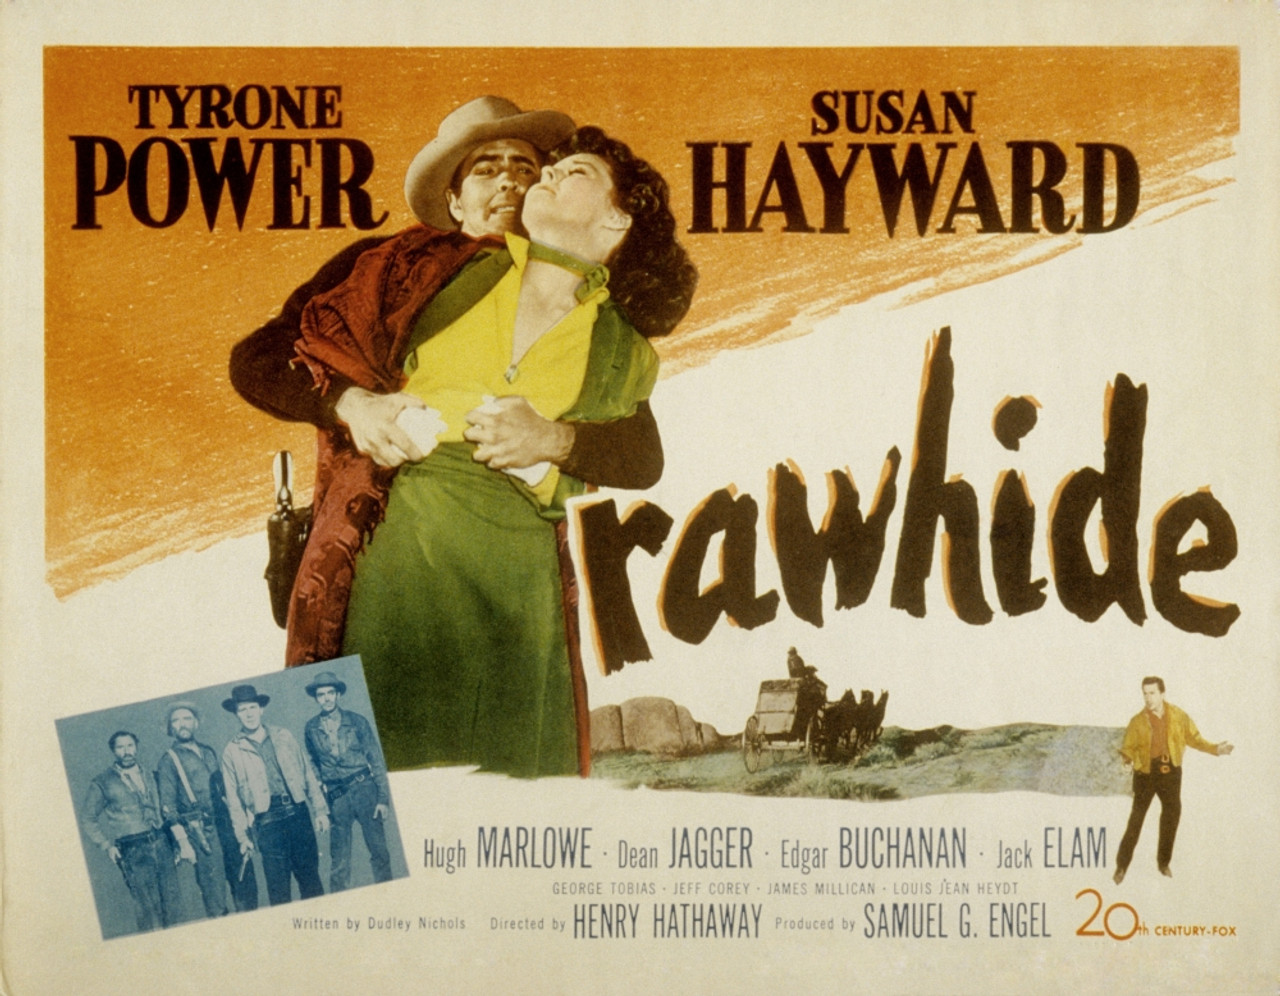 Rawhide Tyrone Power Susan Hayward 1951 Tm And Copyright20Th ...